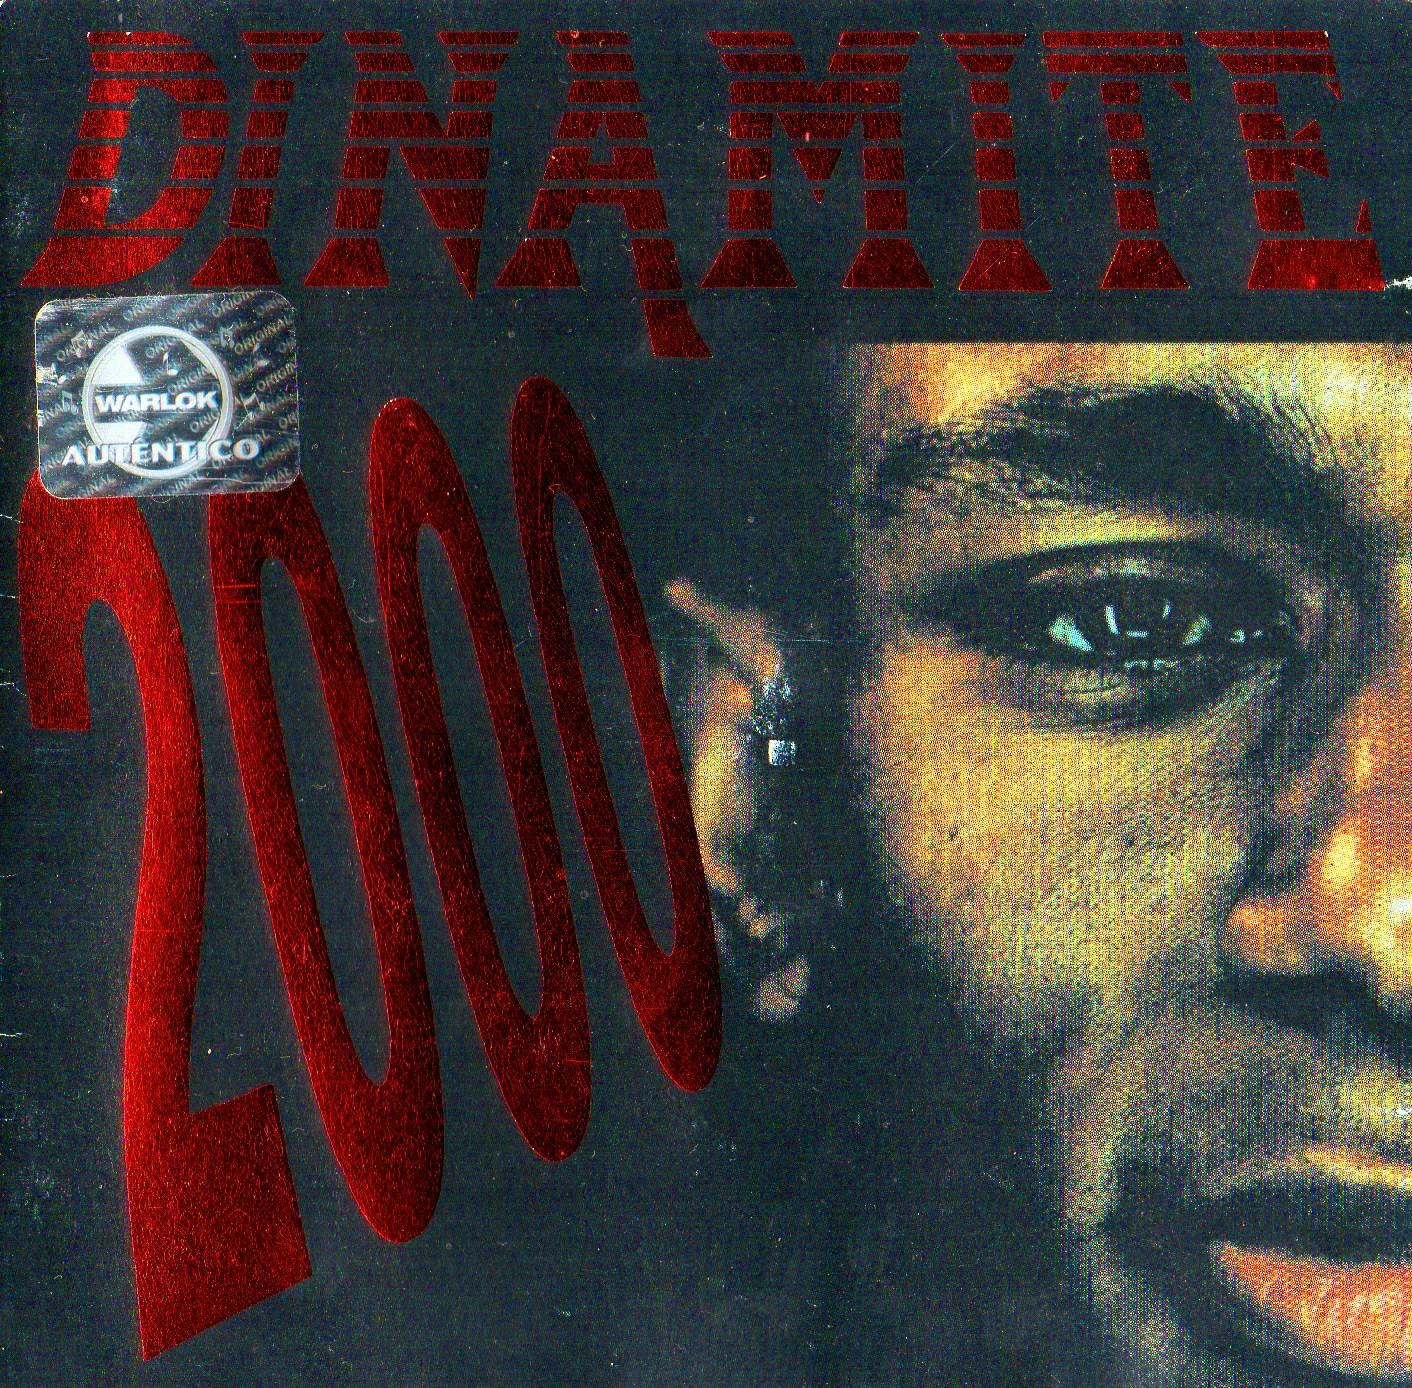 DINAMITE 2000